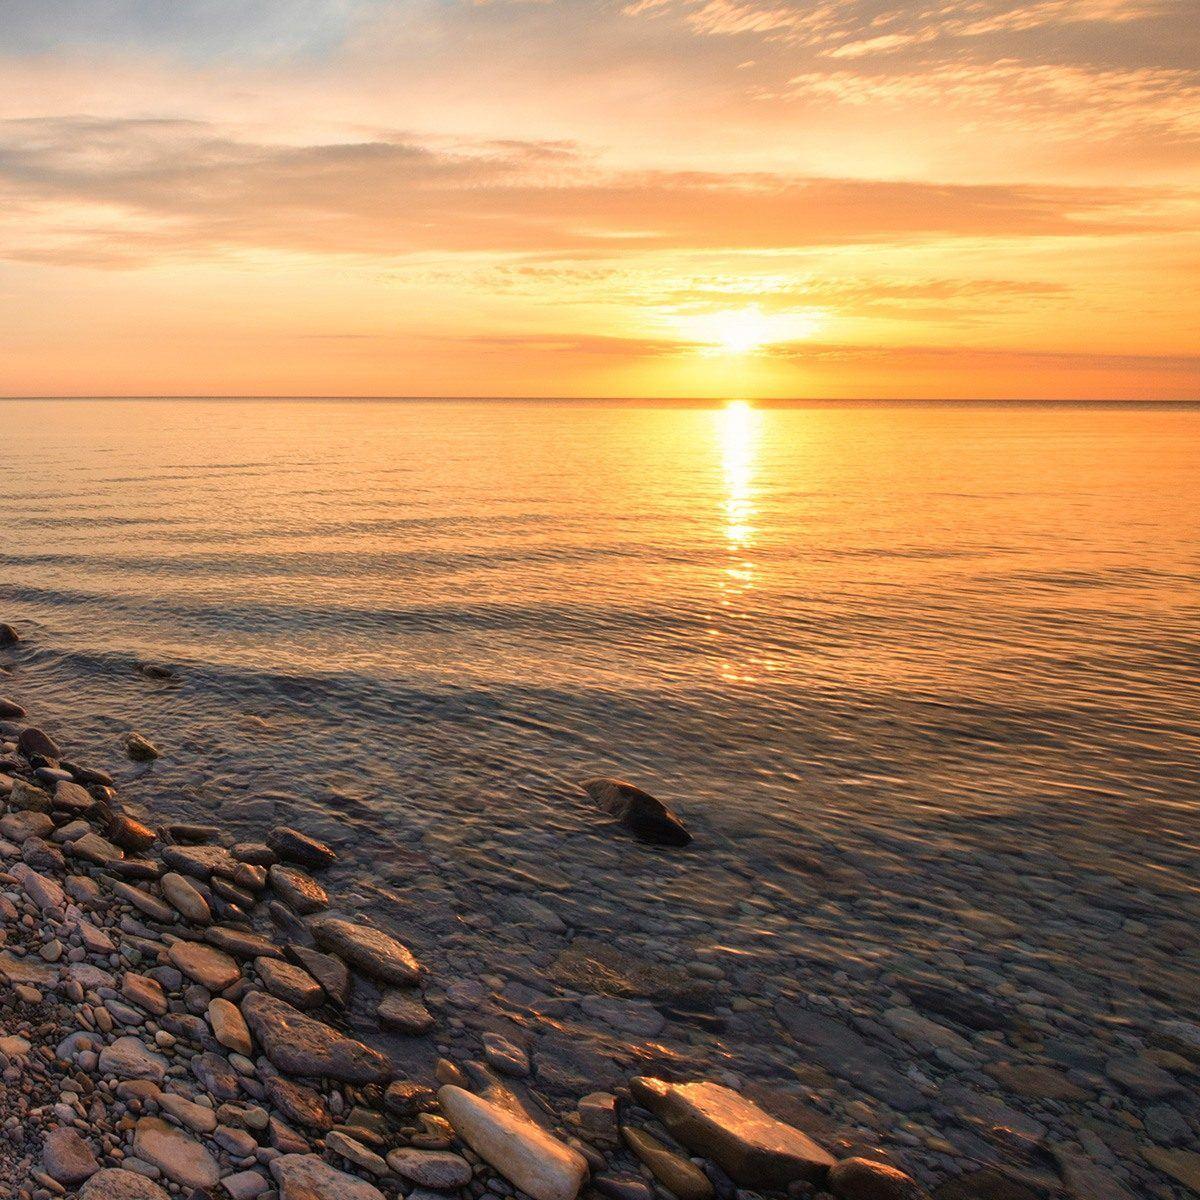 uminar-Presets-Sunset-by-Presetpro.com